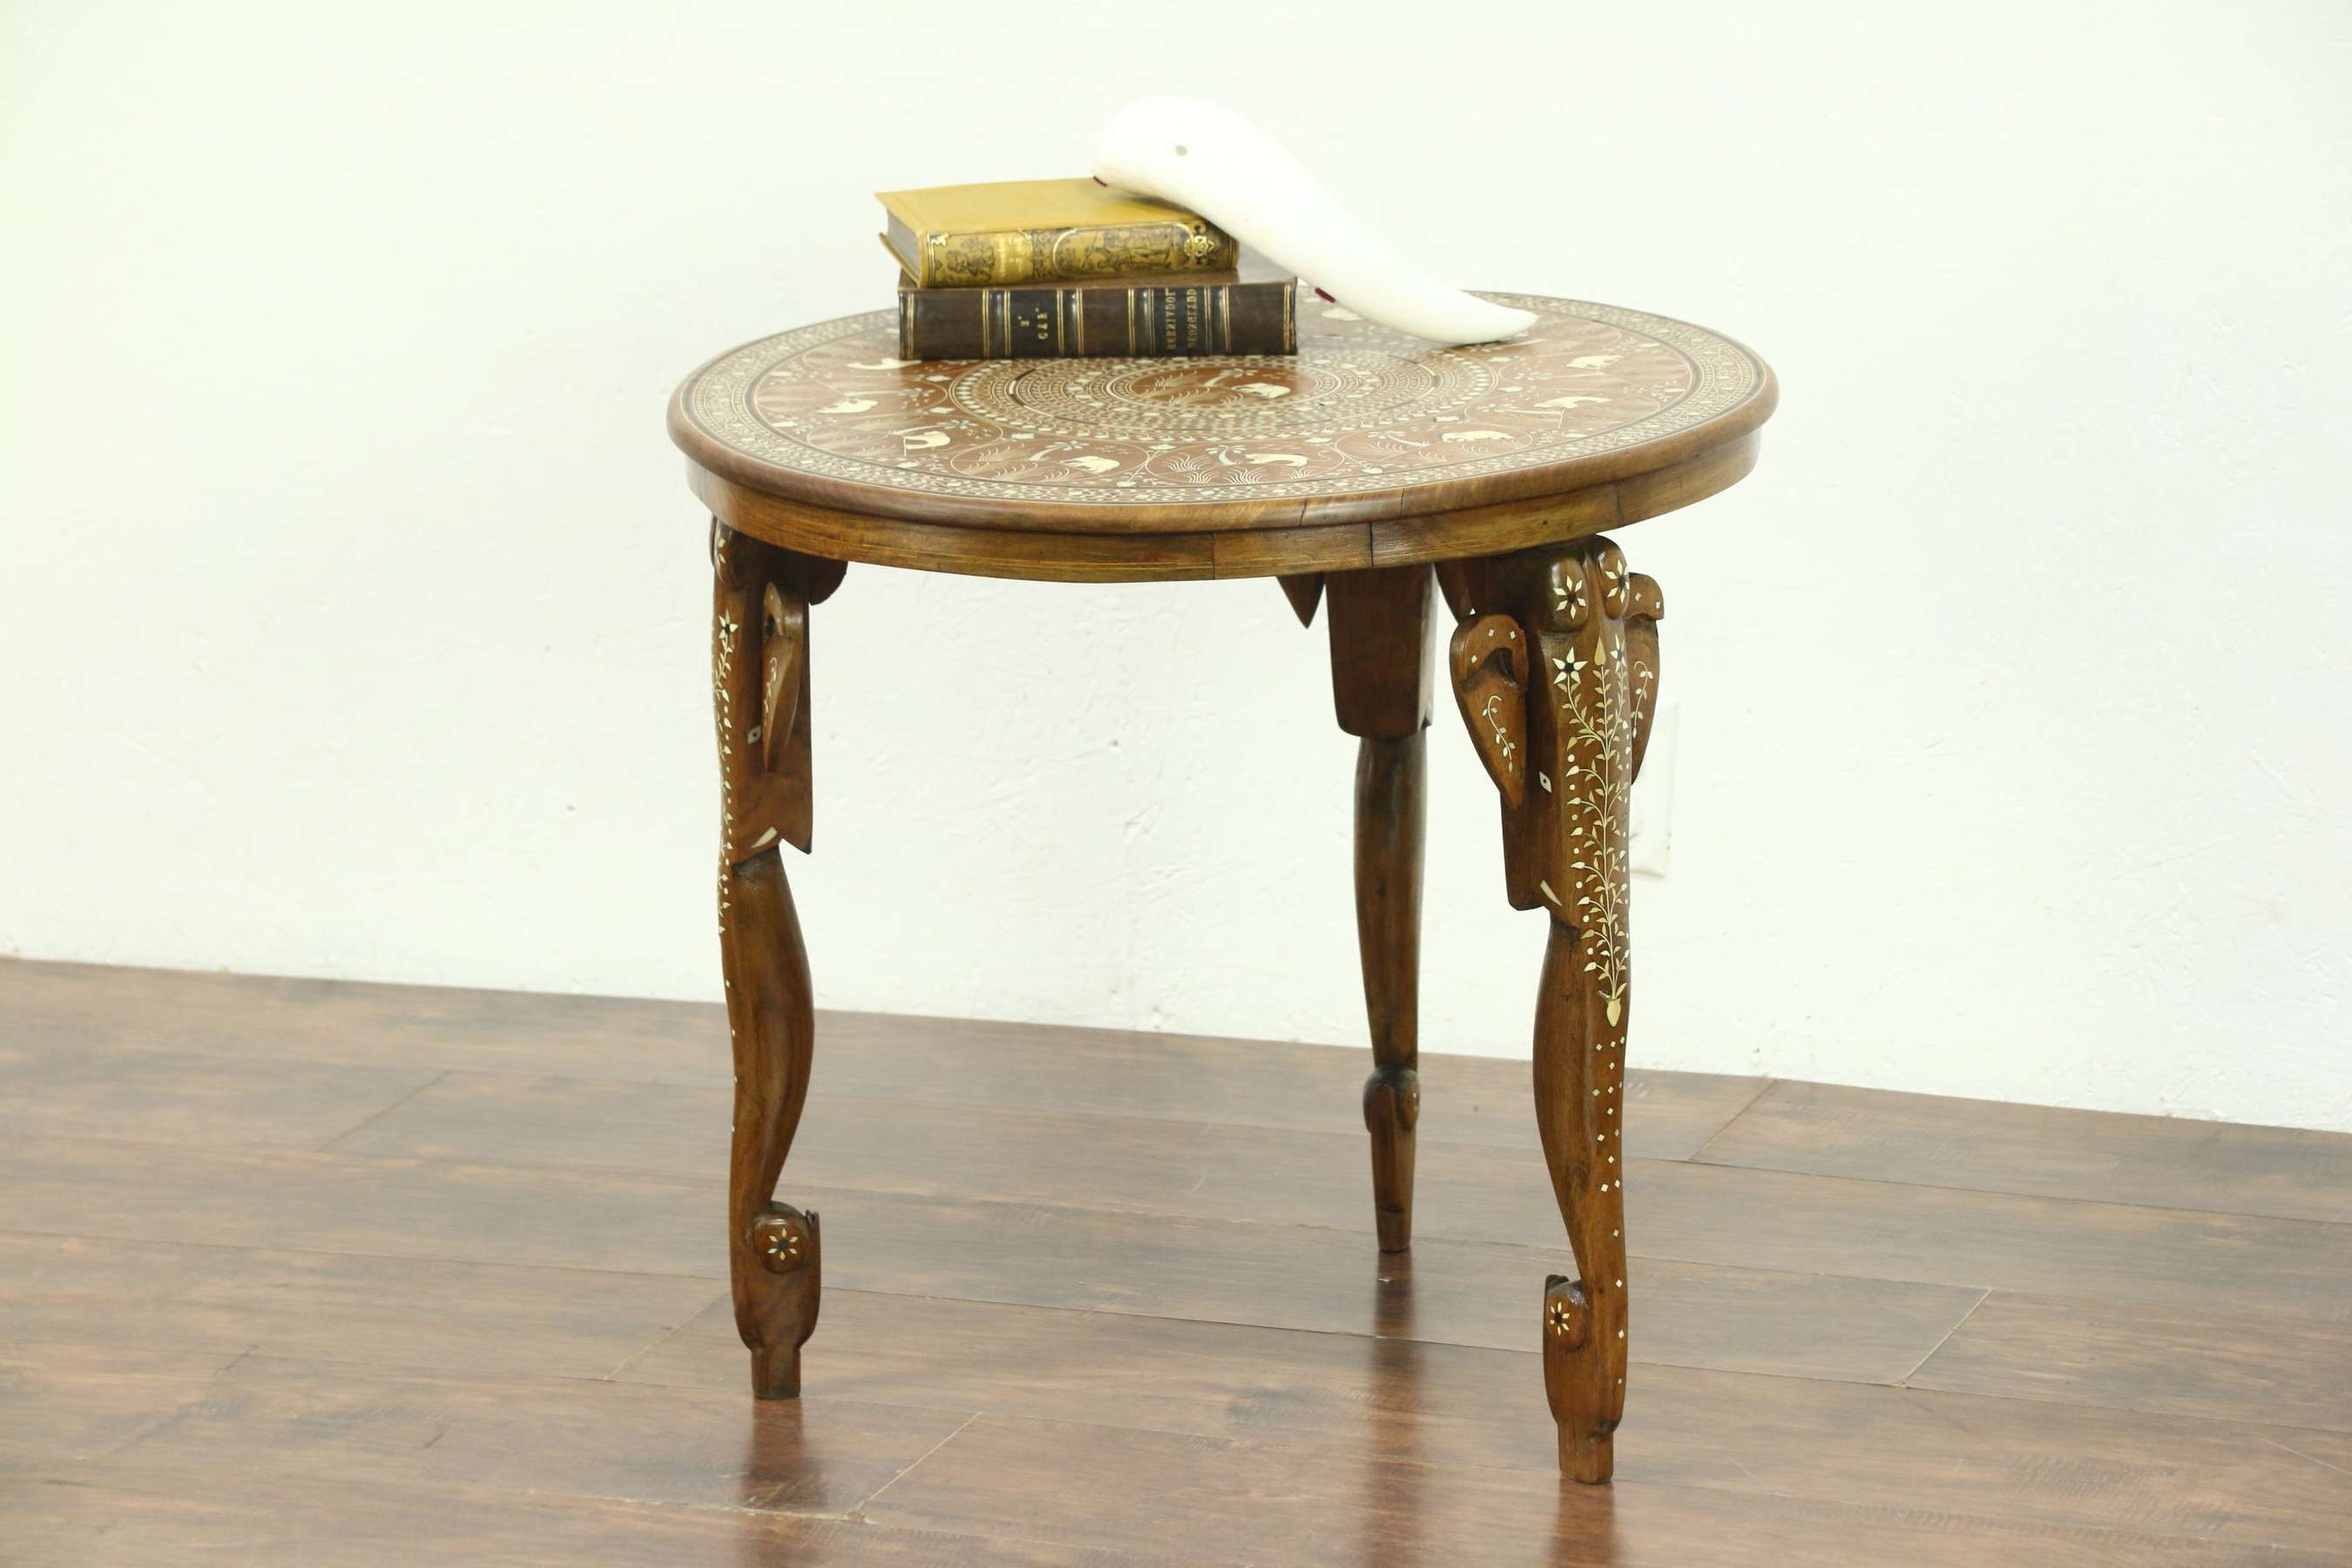 Trendy Elephant Coffee Tables Regarding Sold – Elephant Motif Inlaid Carved Teak & Bone Chairside Or (View 19 of 20)